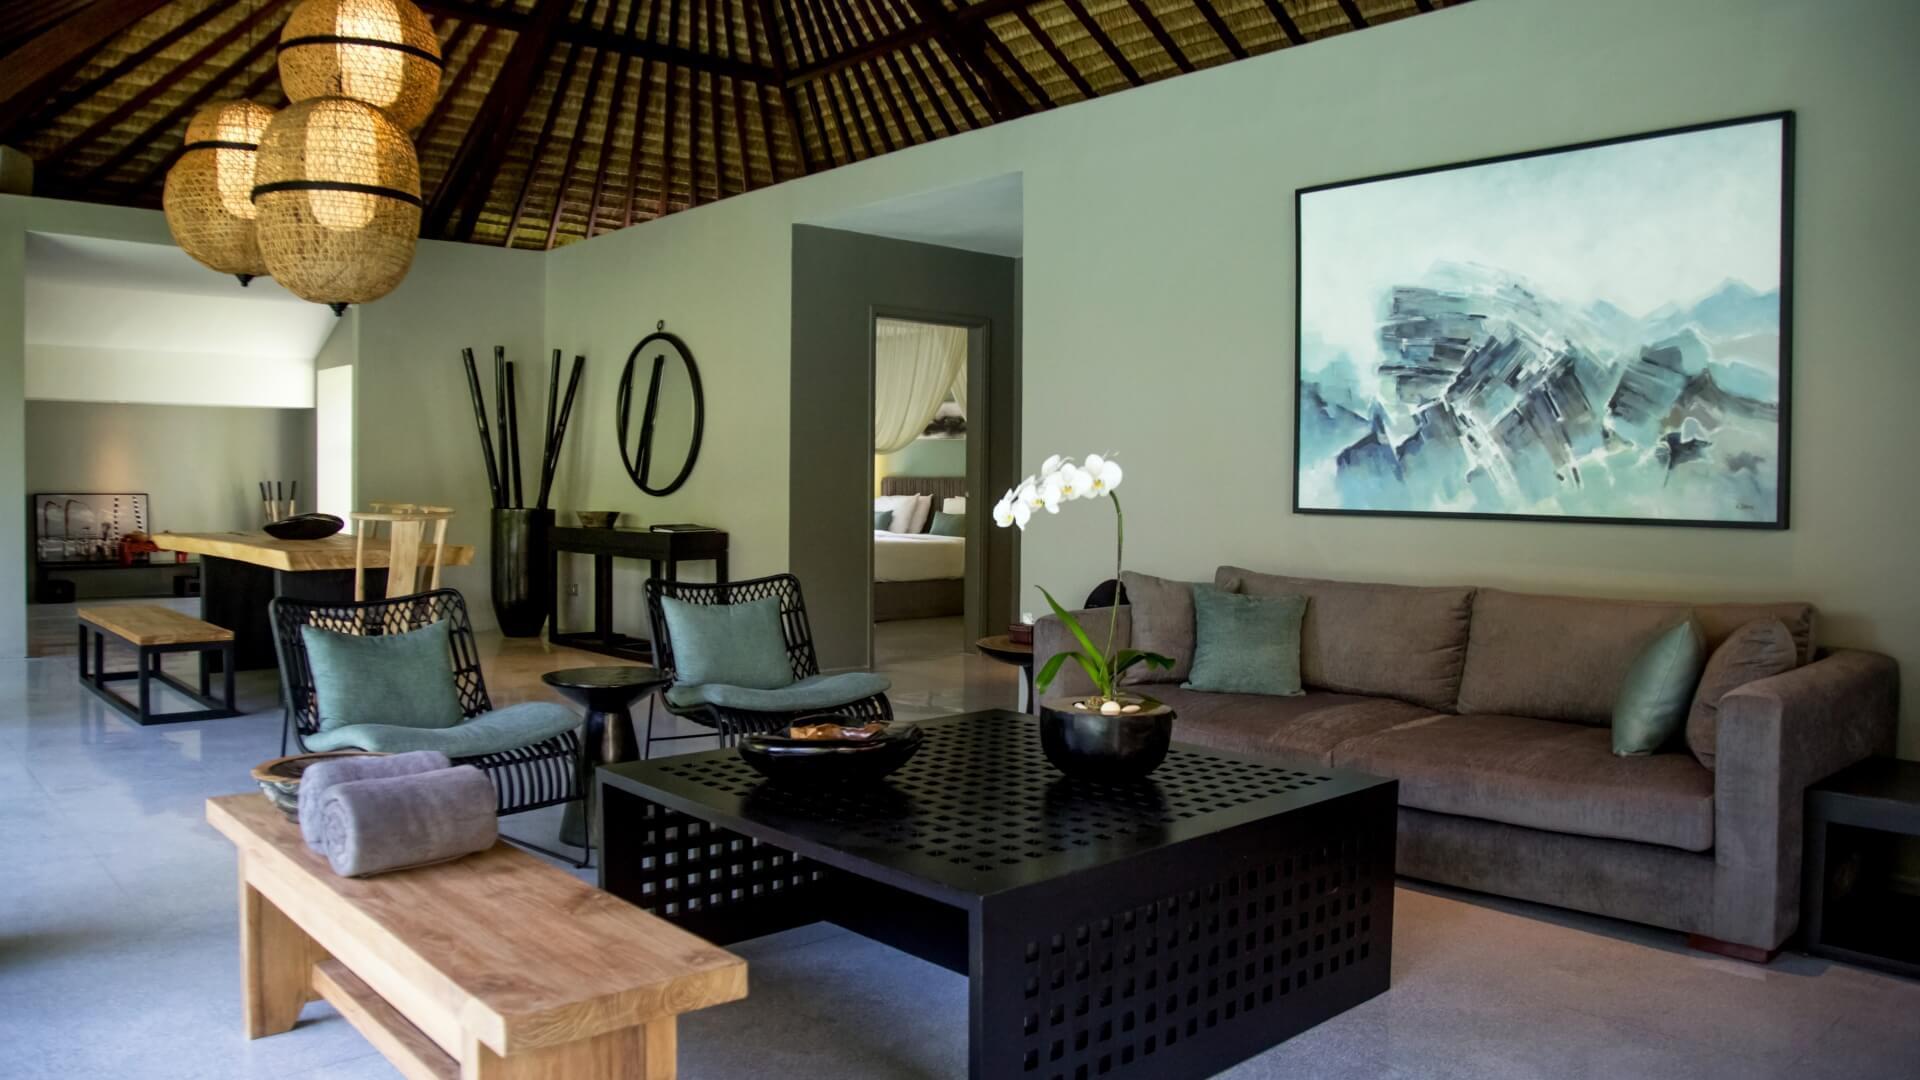 TwoBR Villa-Breakfas TAE, Badung